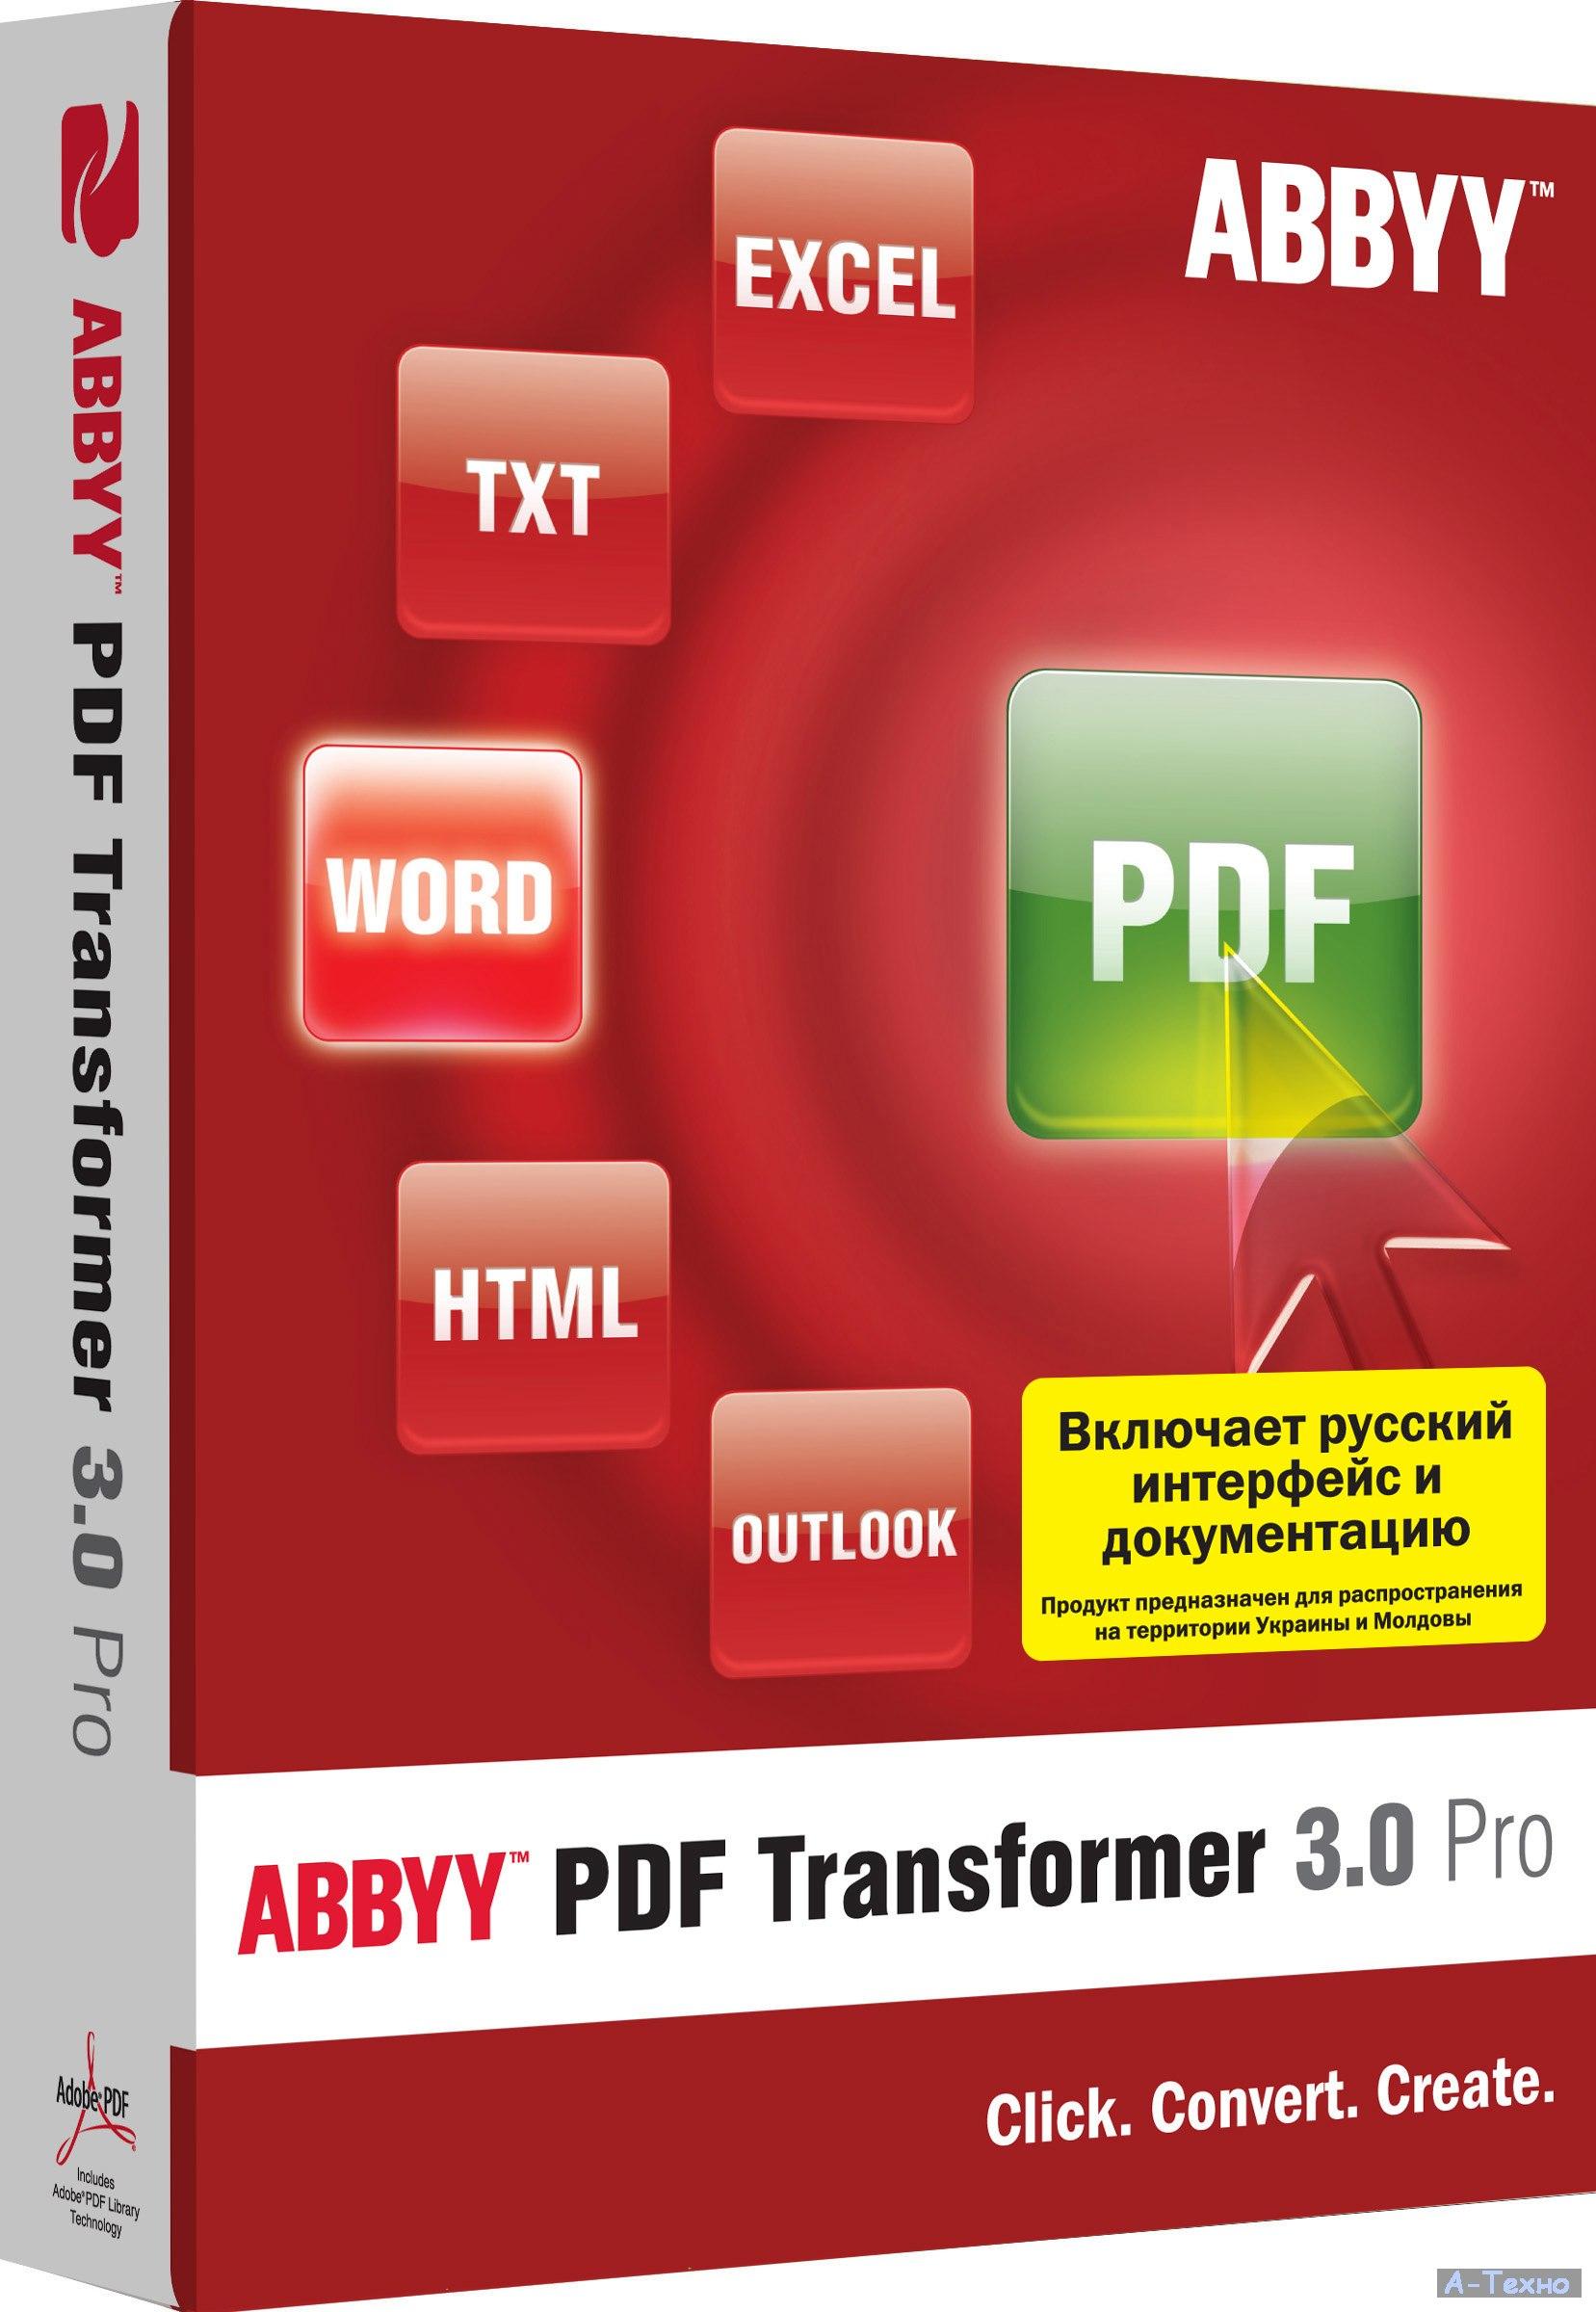 abbyy pdf transformer crack скачать: